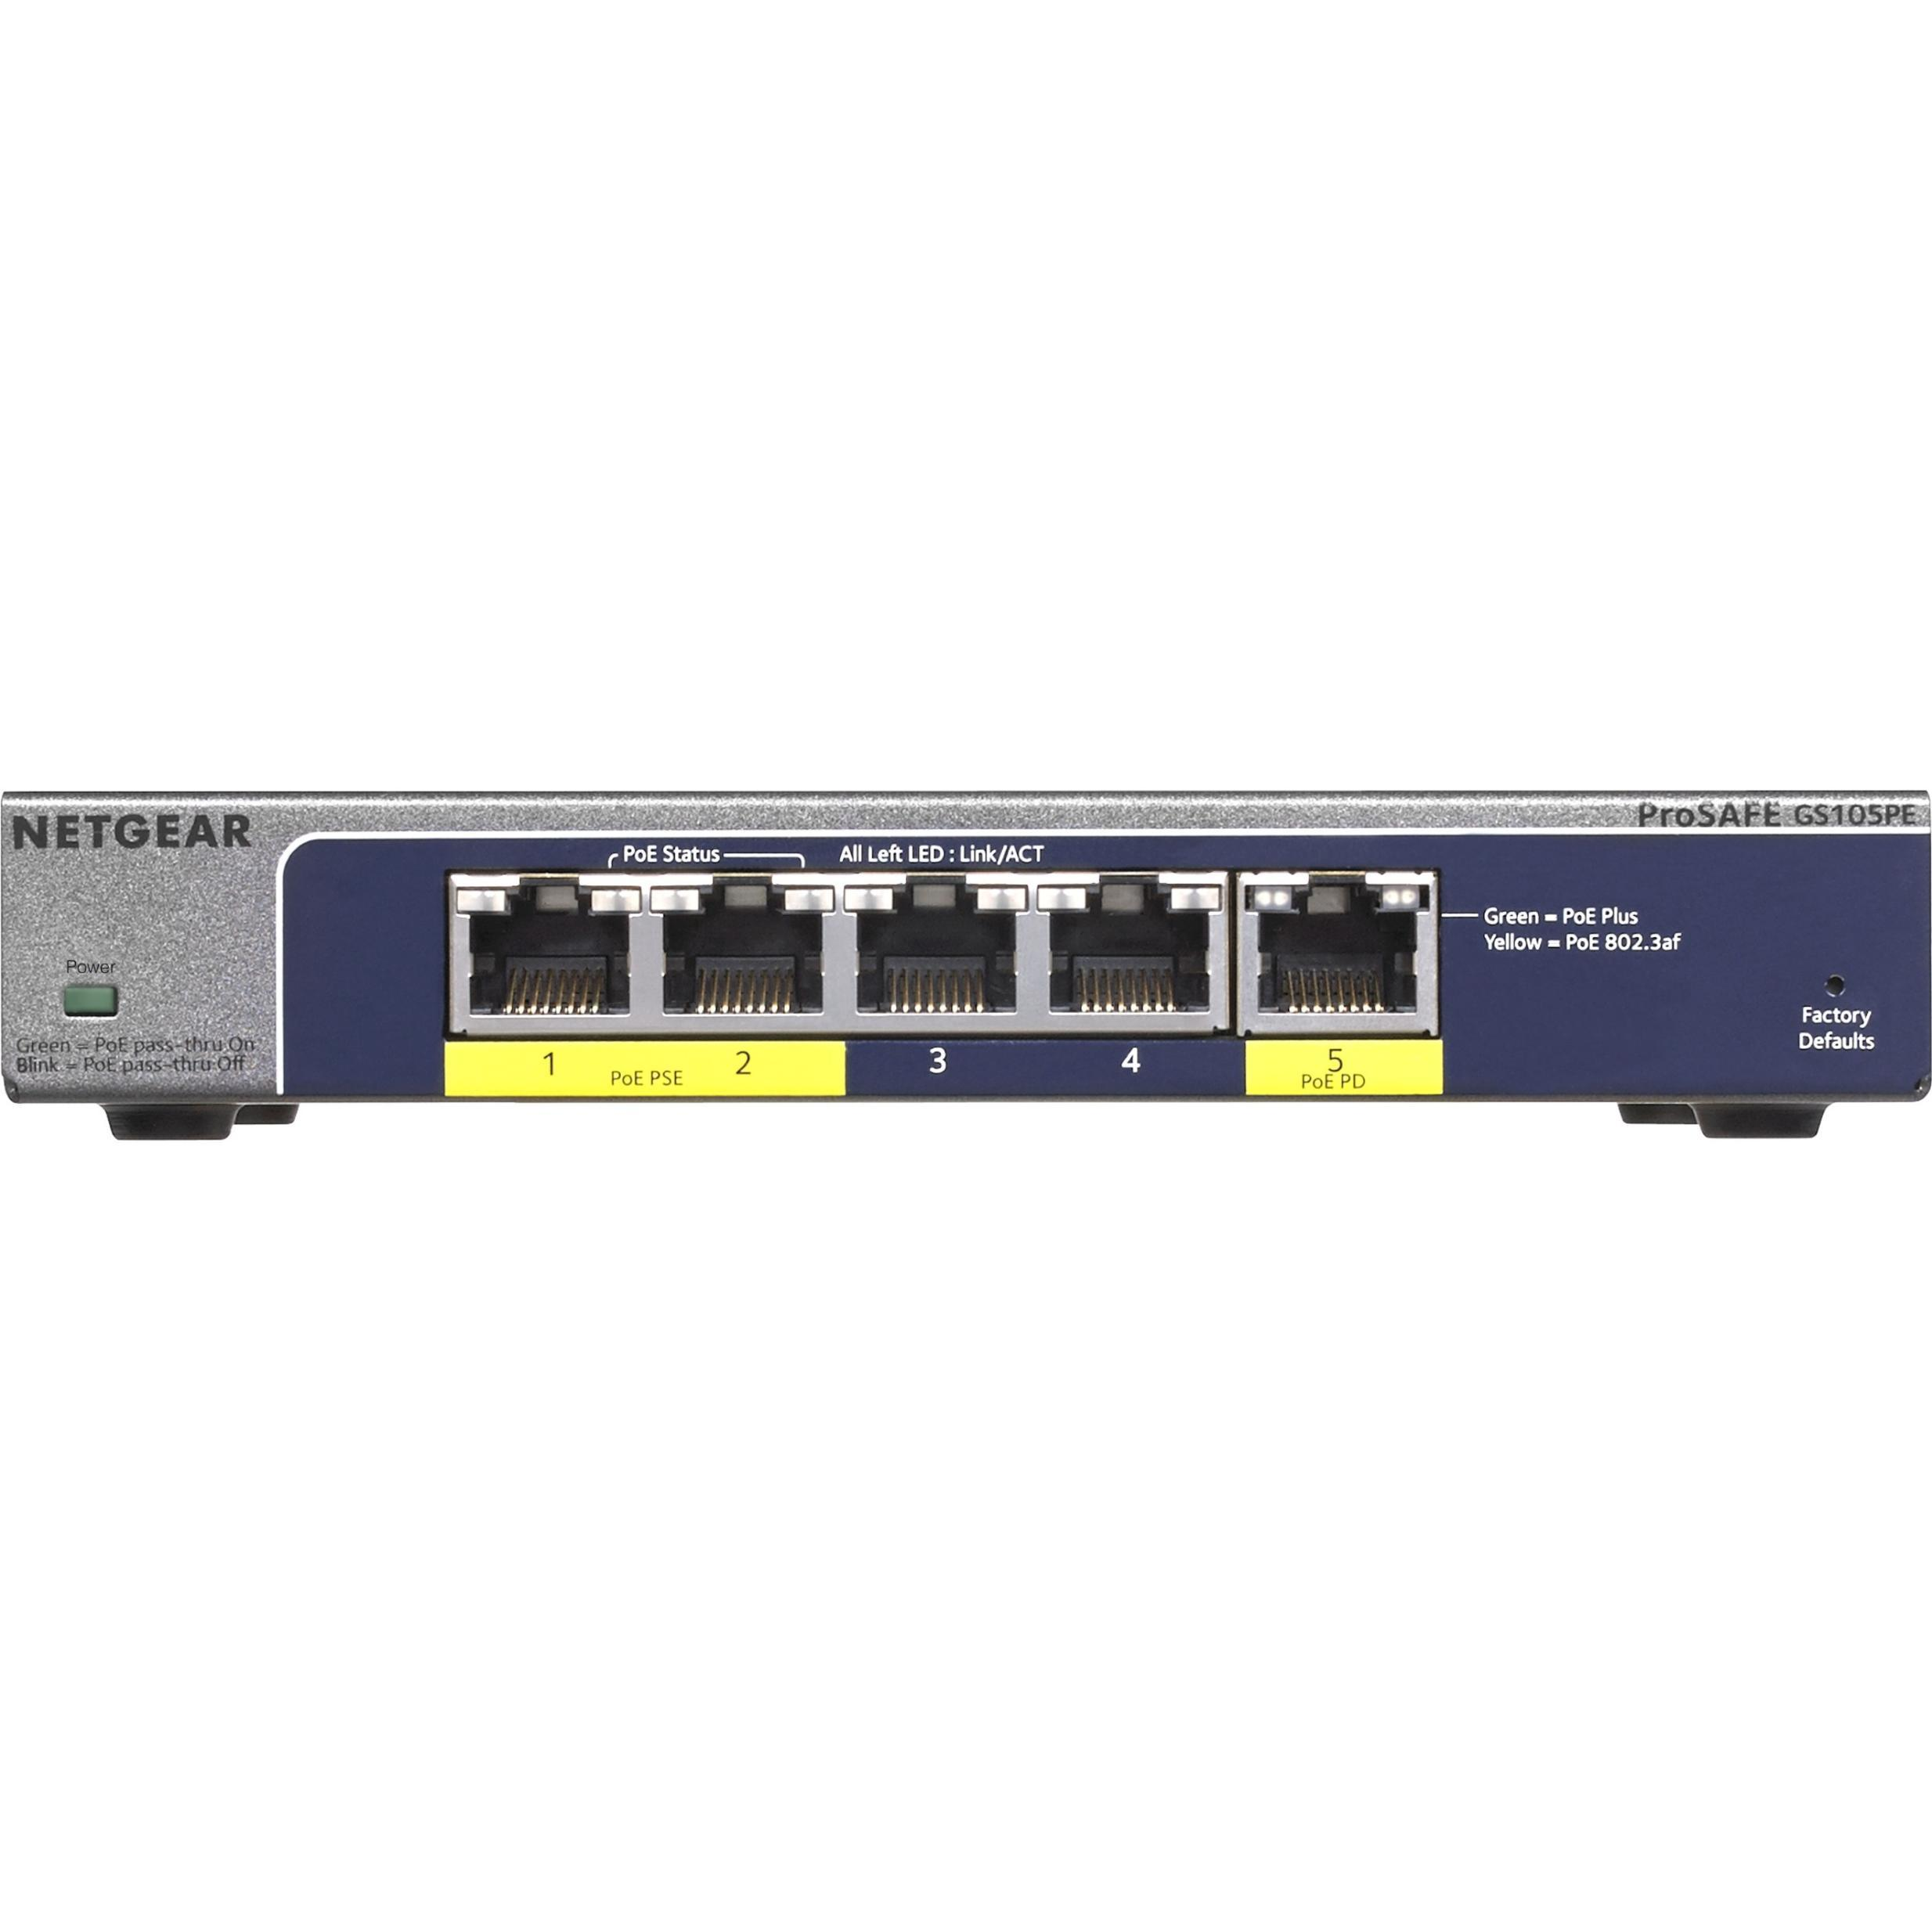 Netgear ProSafe GS105PE 5 Port Gigabit Ethernet Switch